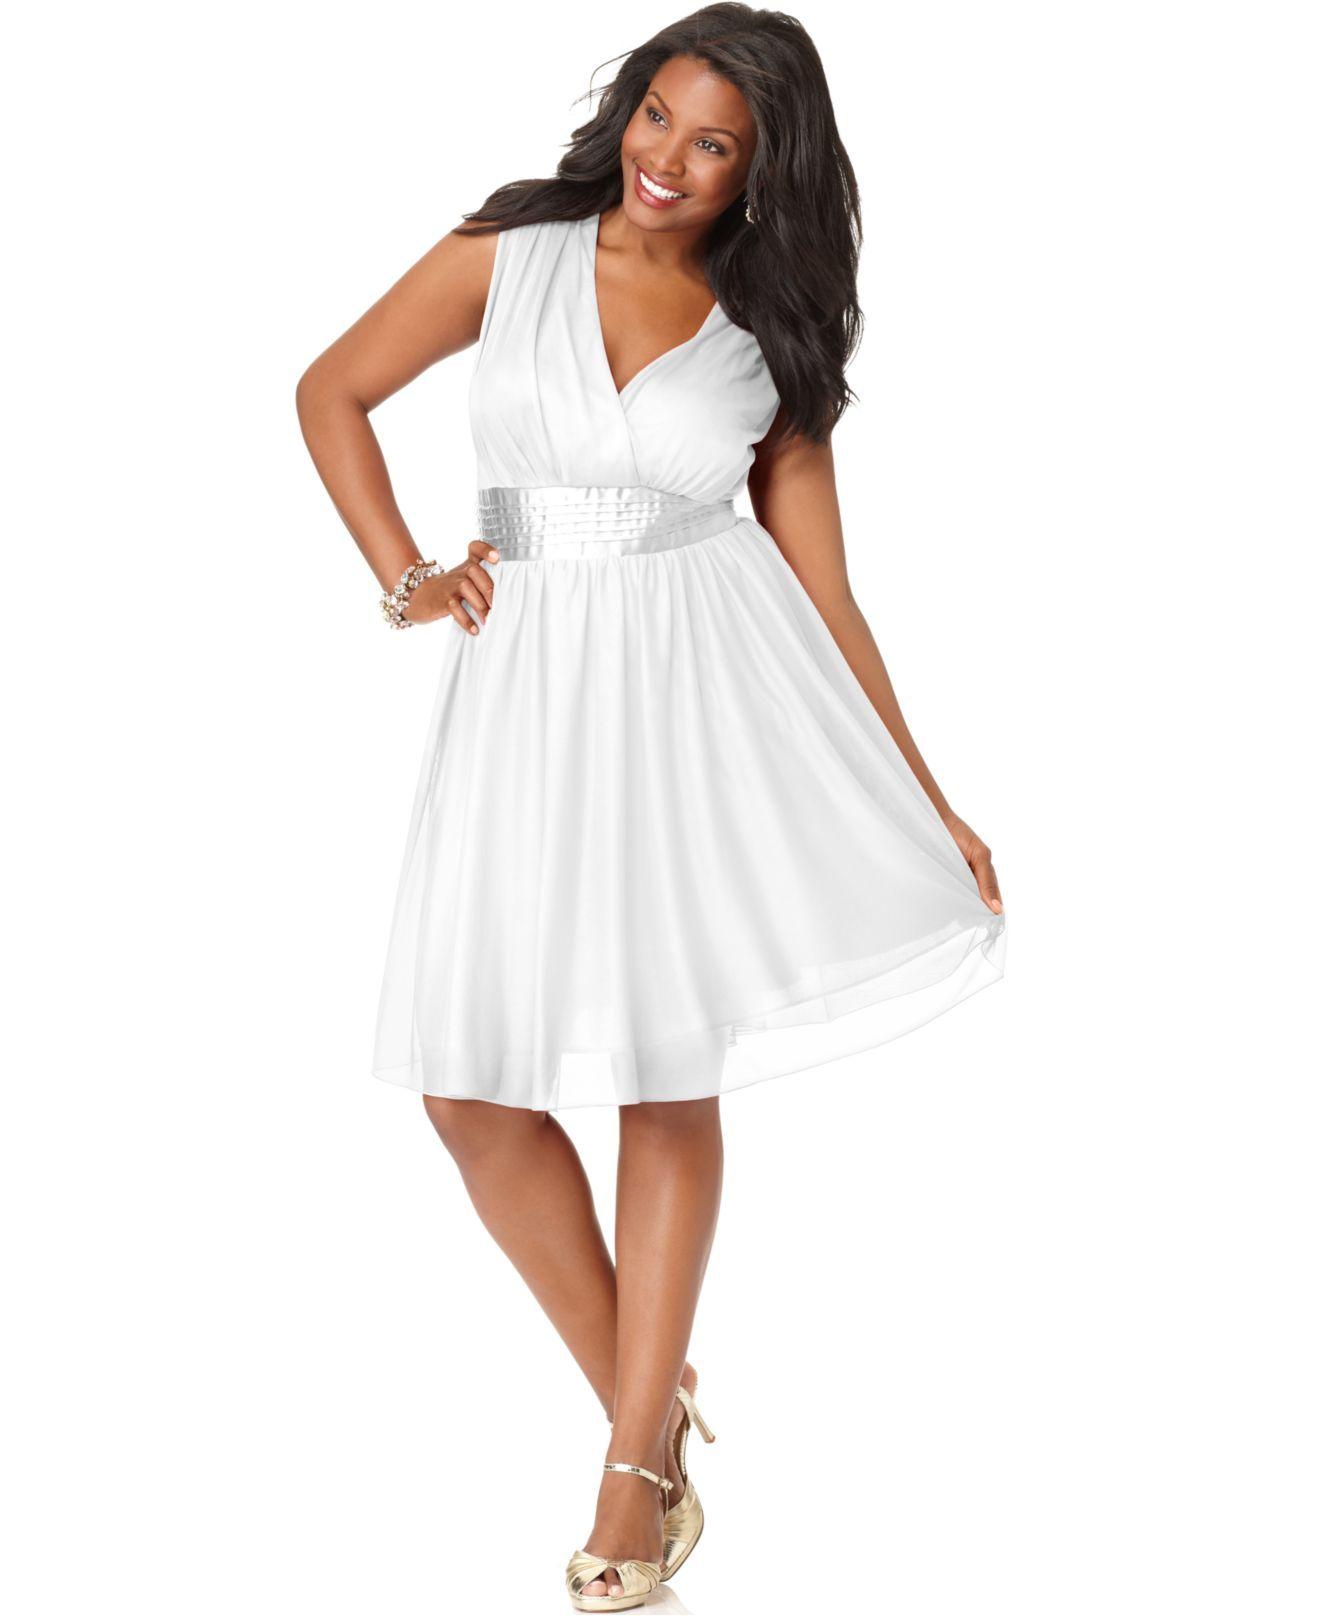 Trixxi Plus Size Prom Dress Sleeveless Banded Empire A Line Plus